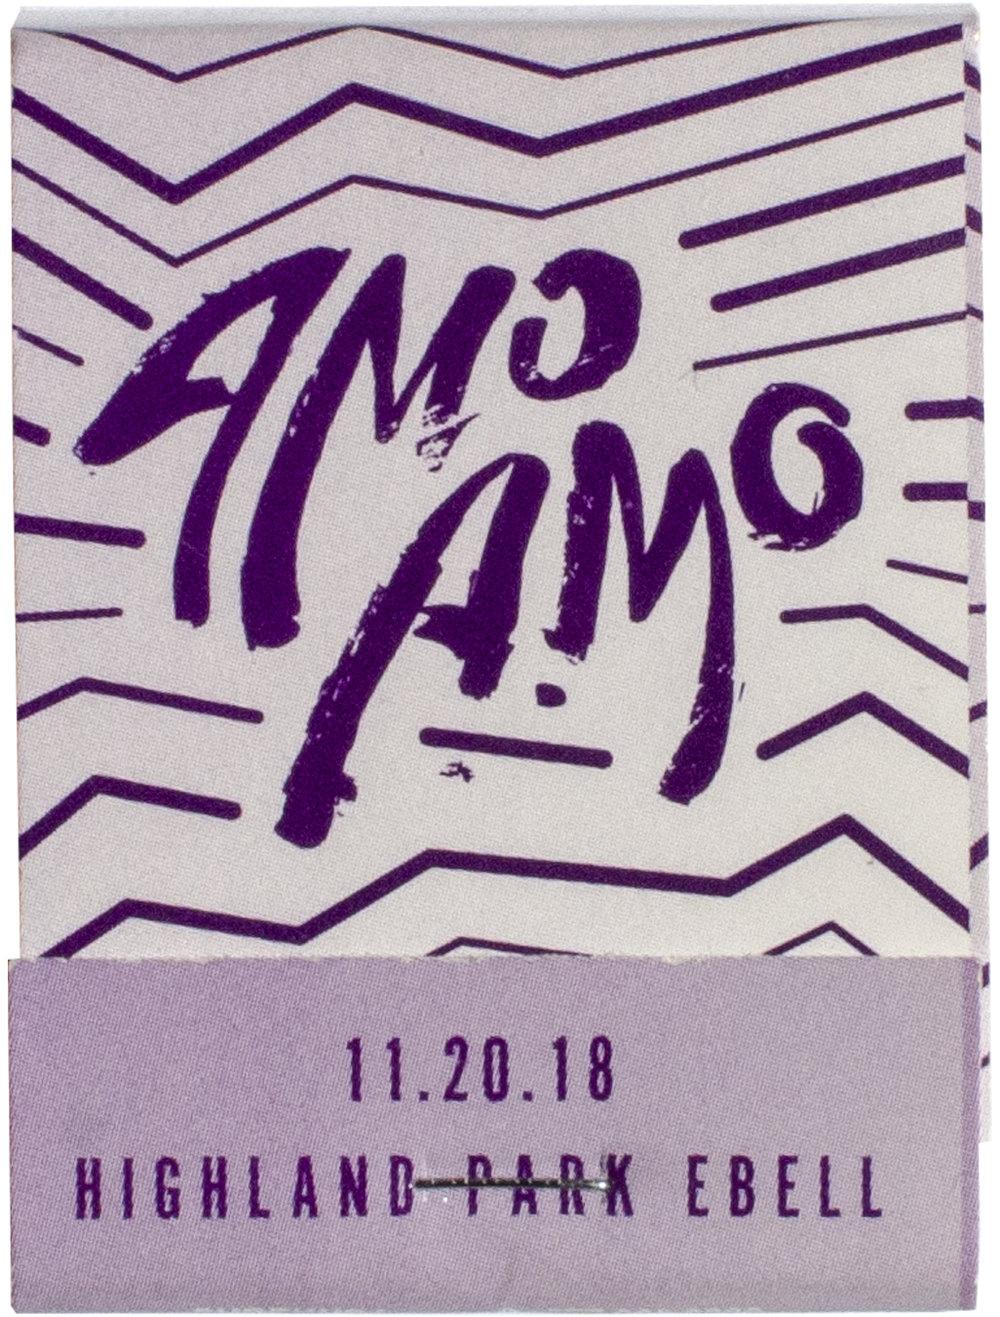 2018.11.20 Amo Amo.jpg